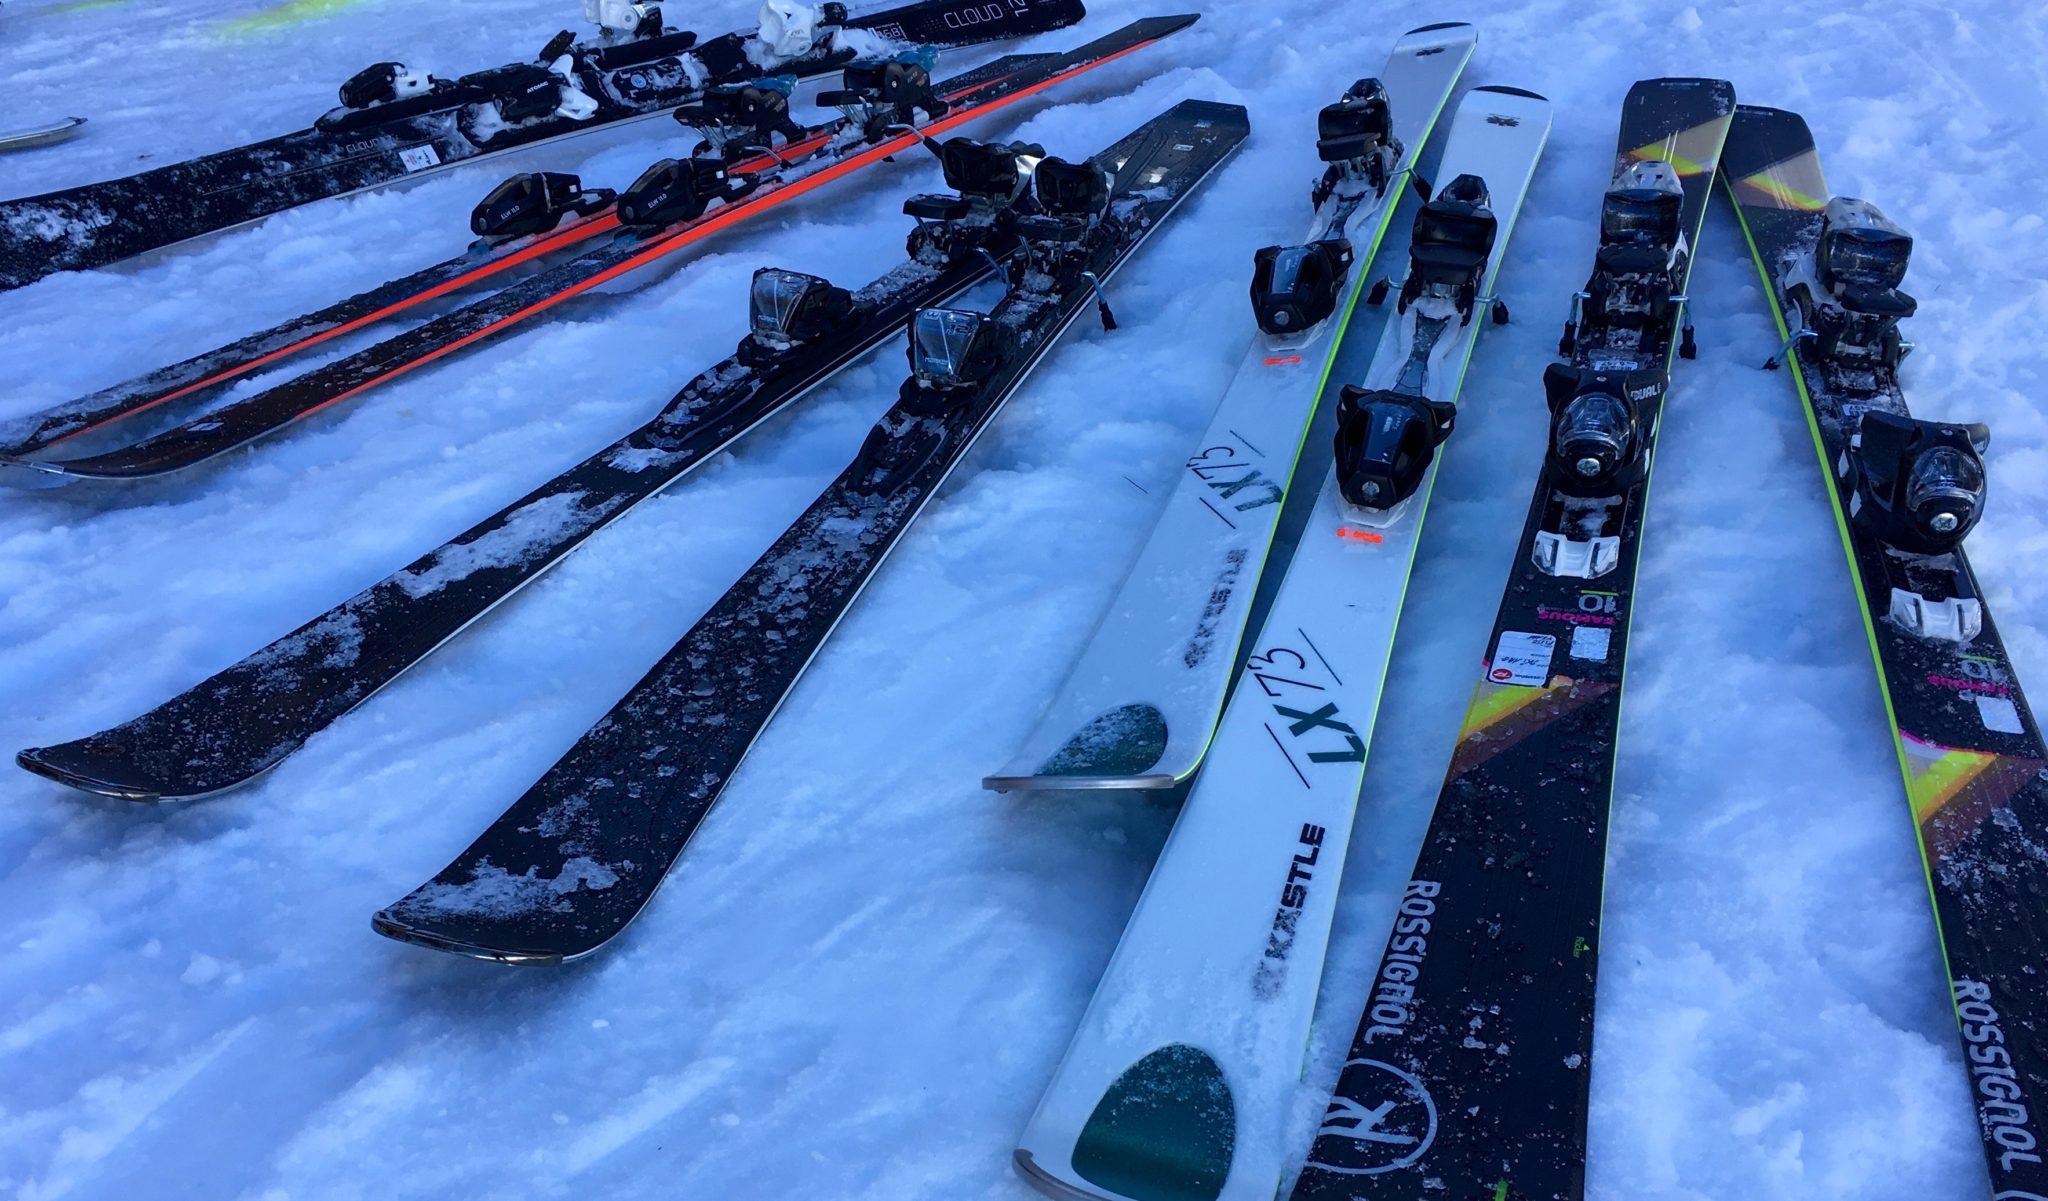 skis-femmes-piste-polyvalent-skieuses-montagne-alpin